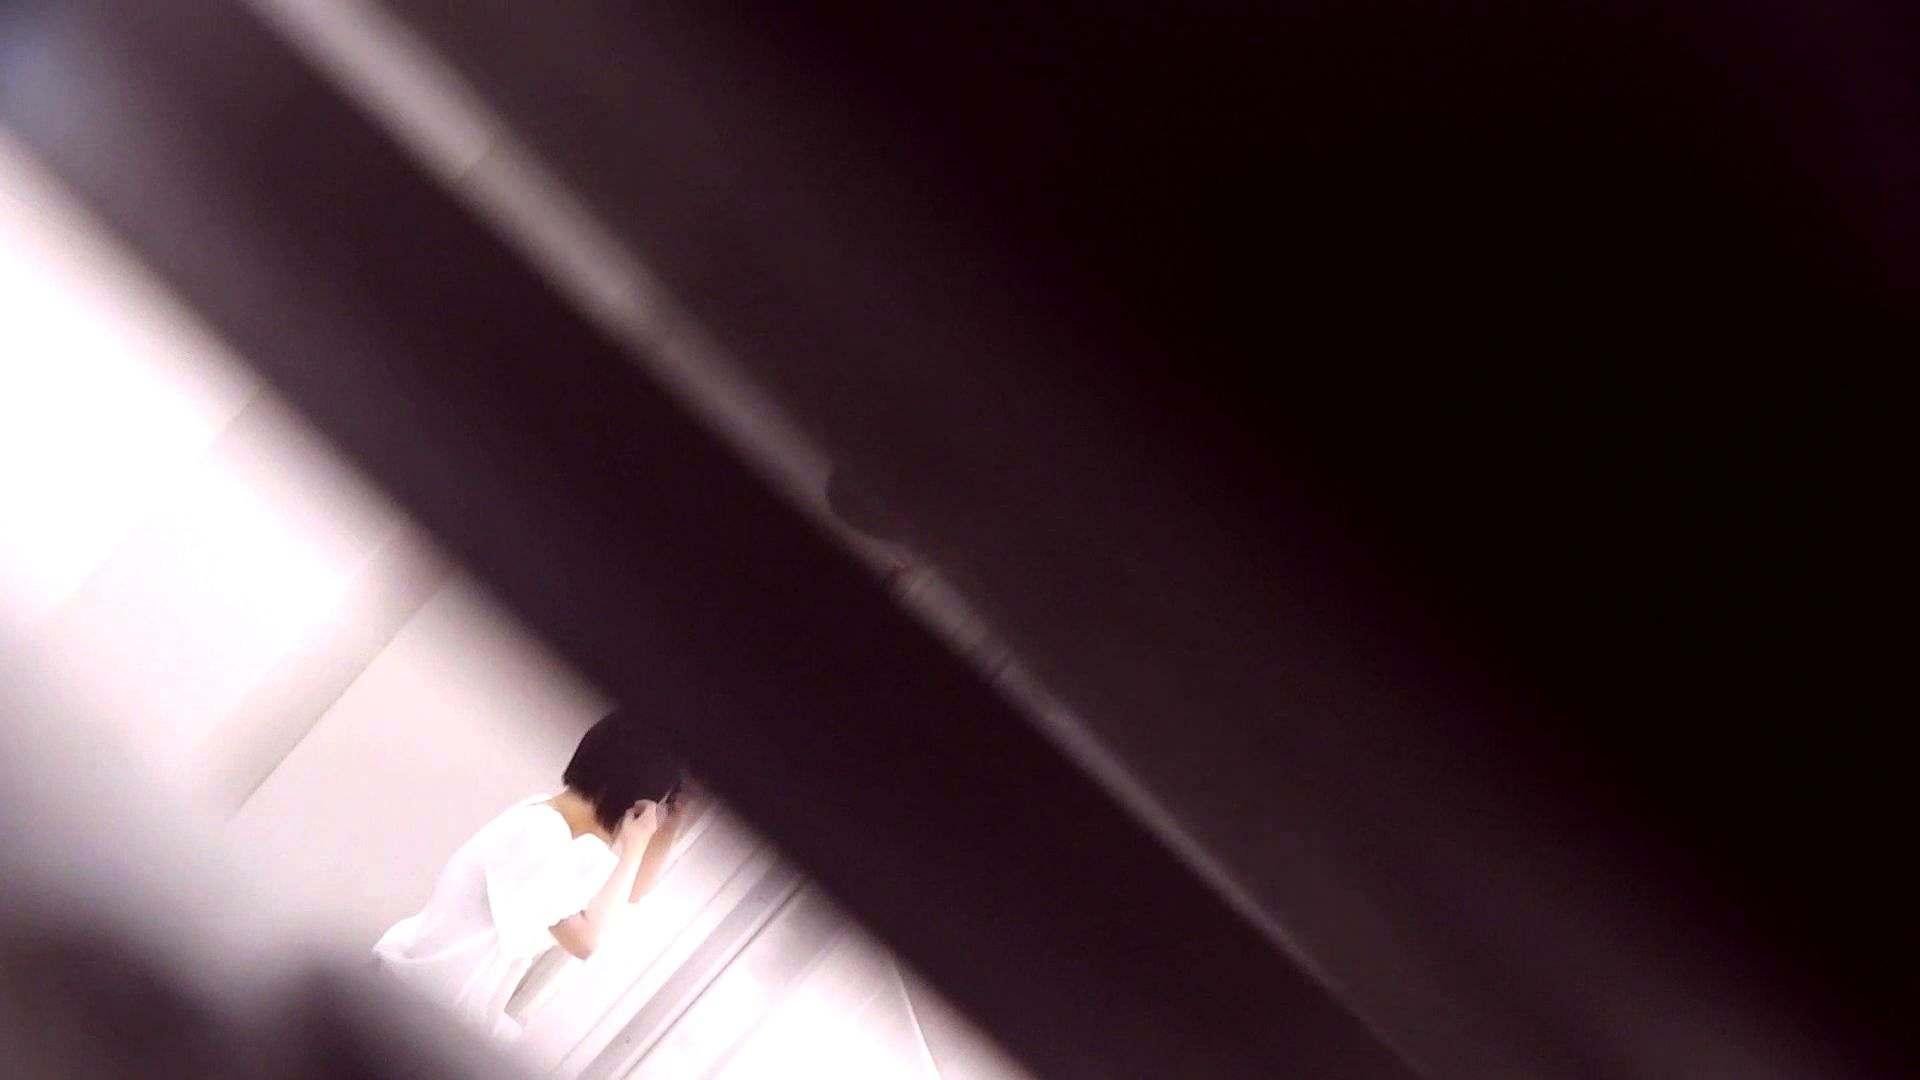 vol.17 命がけ潜伏洗面所! 張り裂けんばかりの大物 潜入 盗み撮り動画 69連発 40